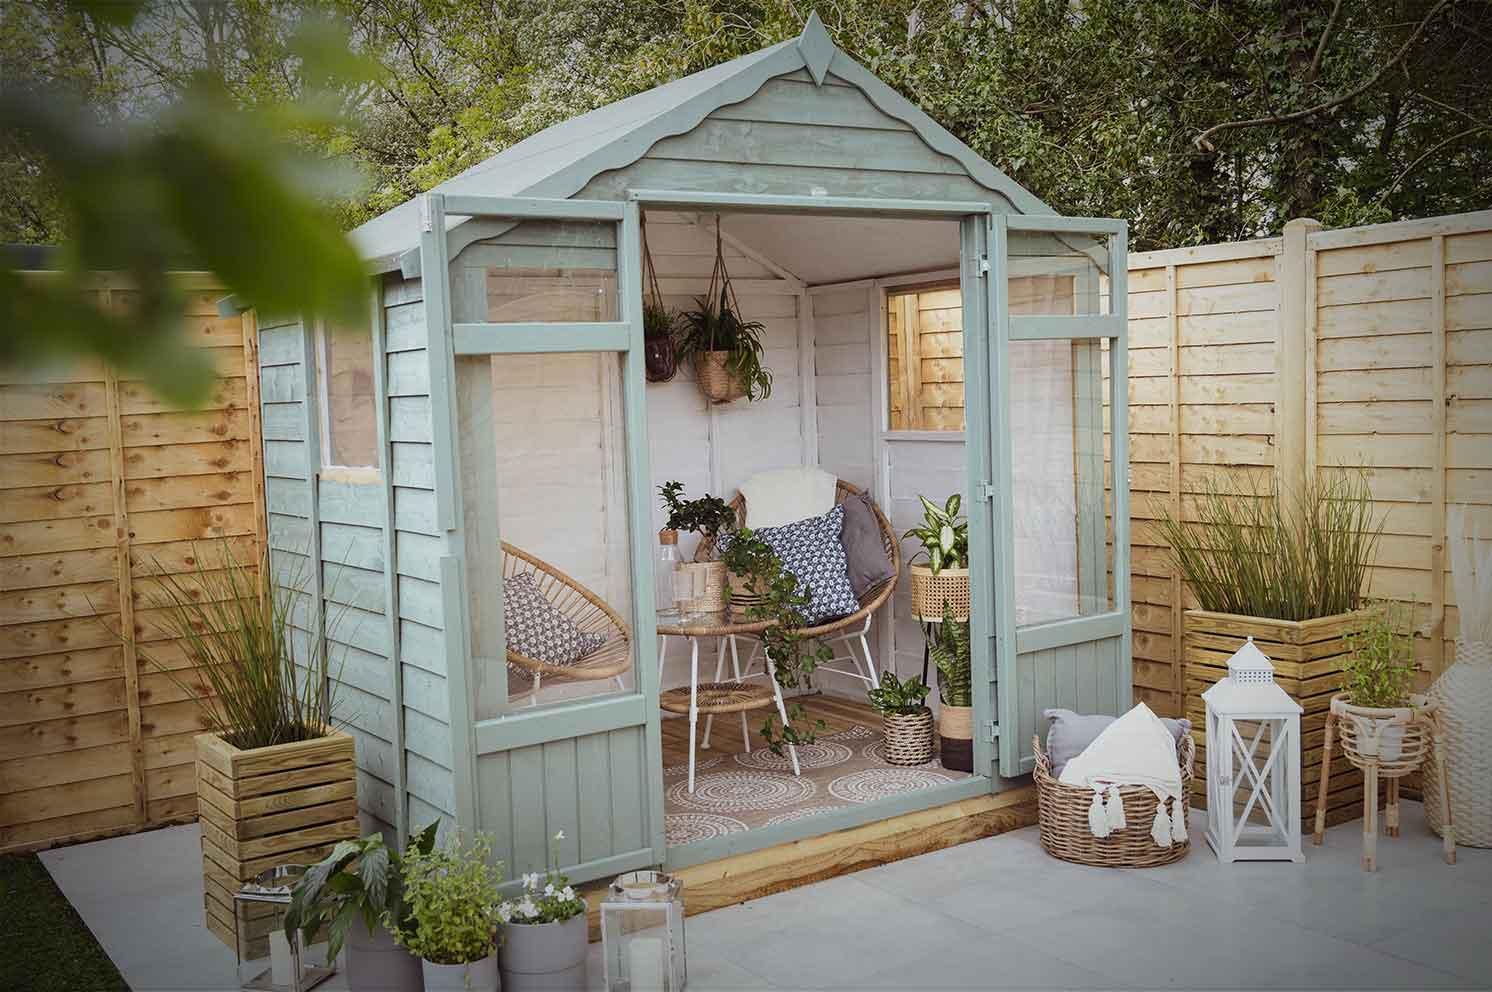 Thorndown-Paint-Forest-Oakley-Summerhouse-Blog